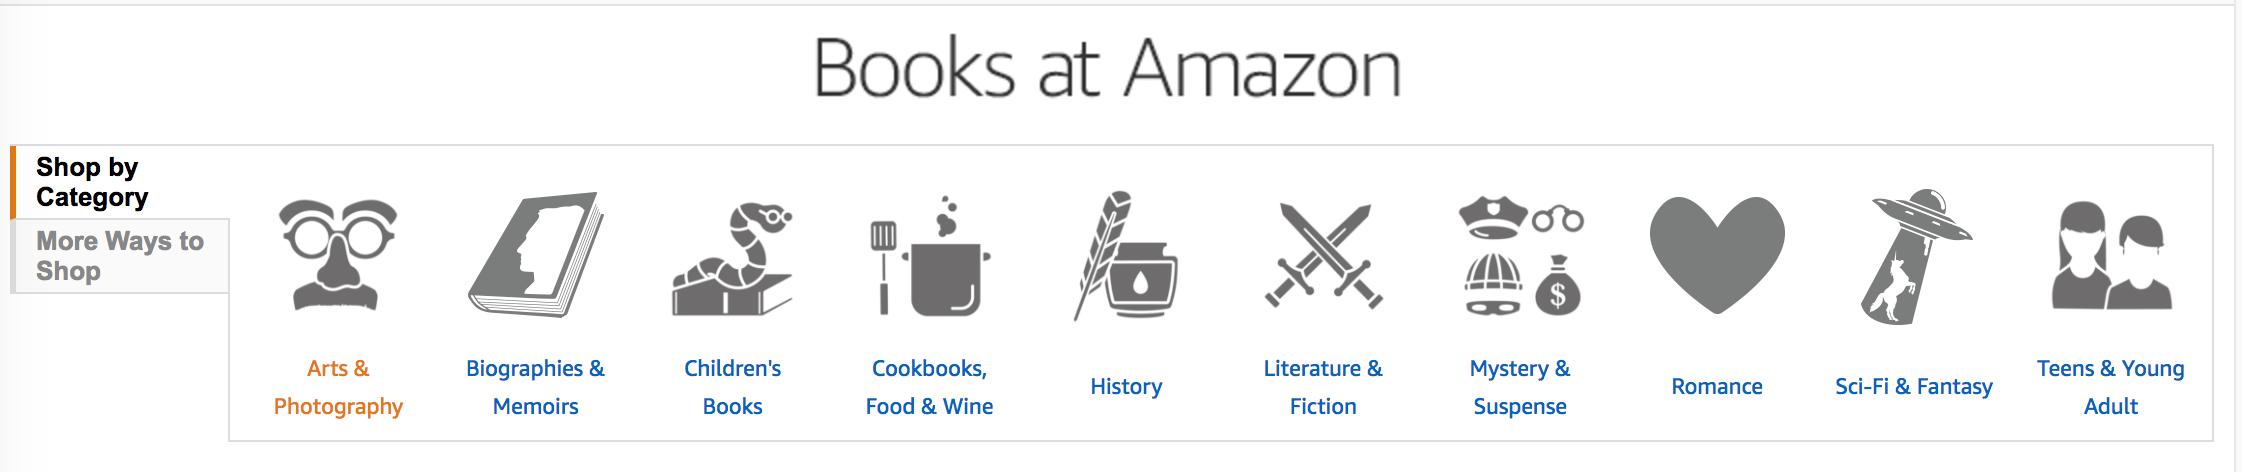 Top-level Categories on Amazon